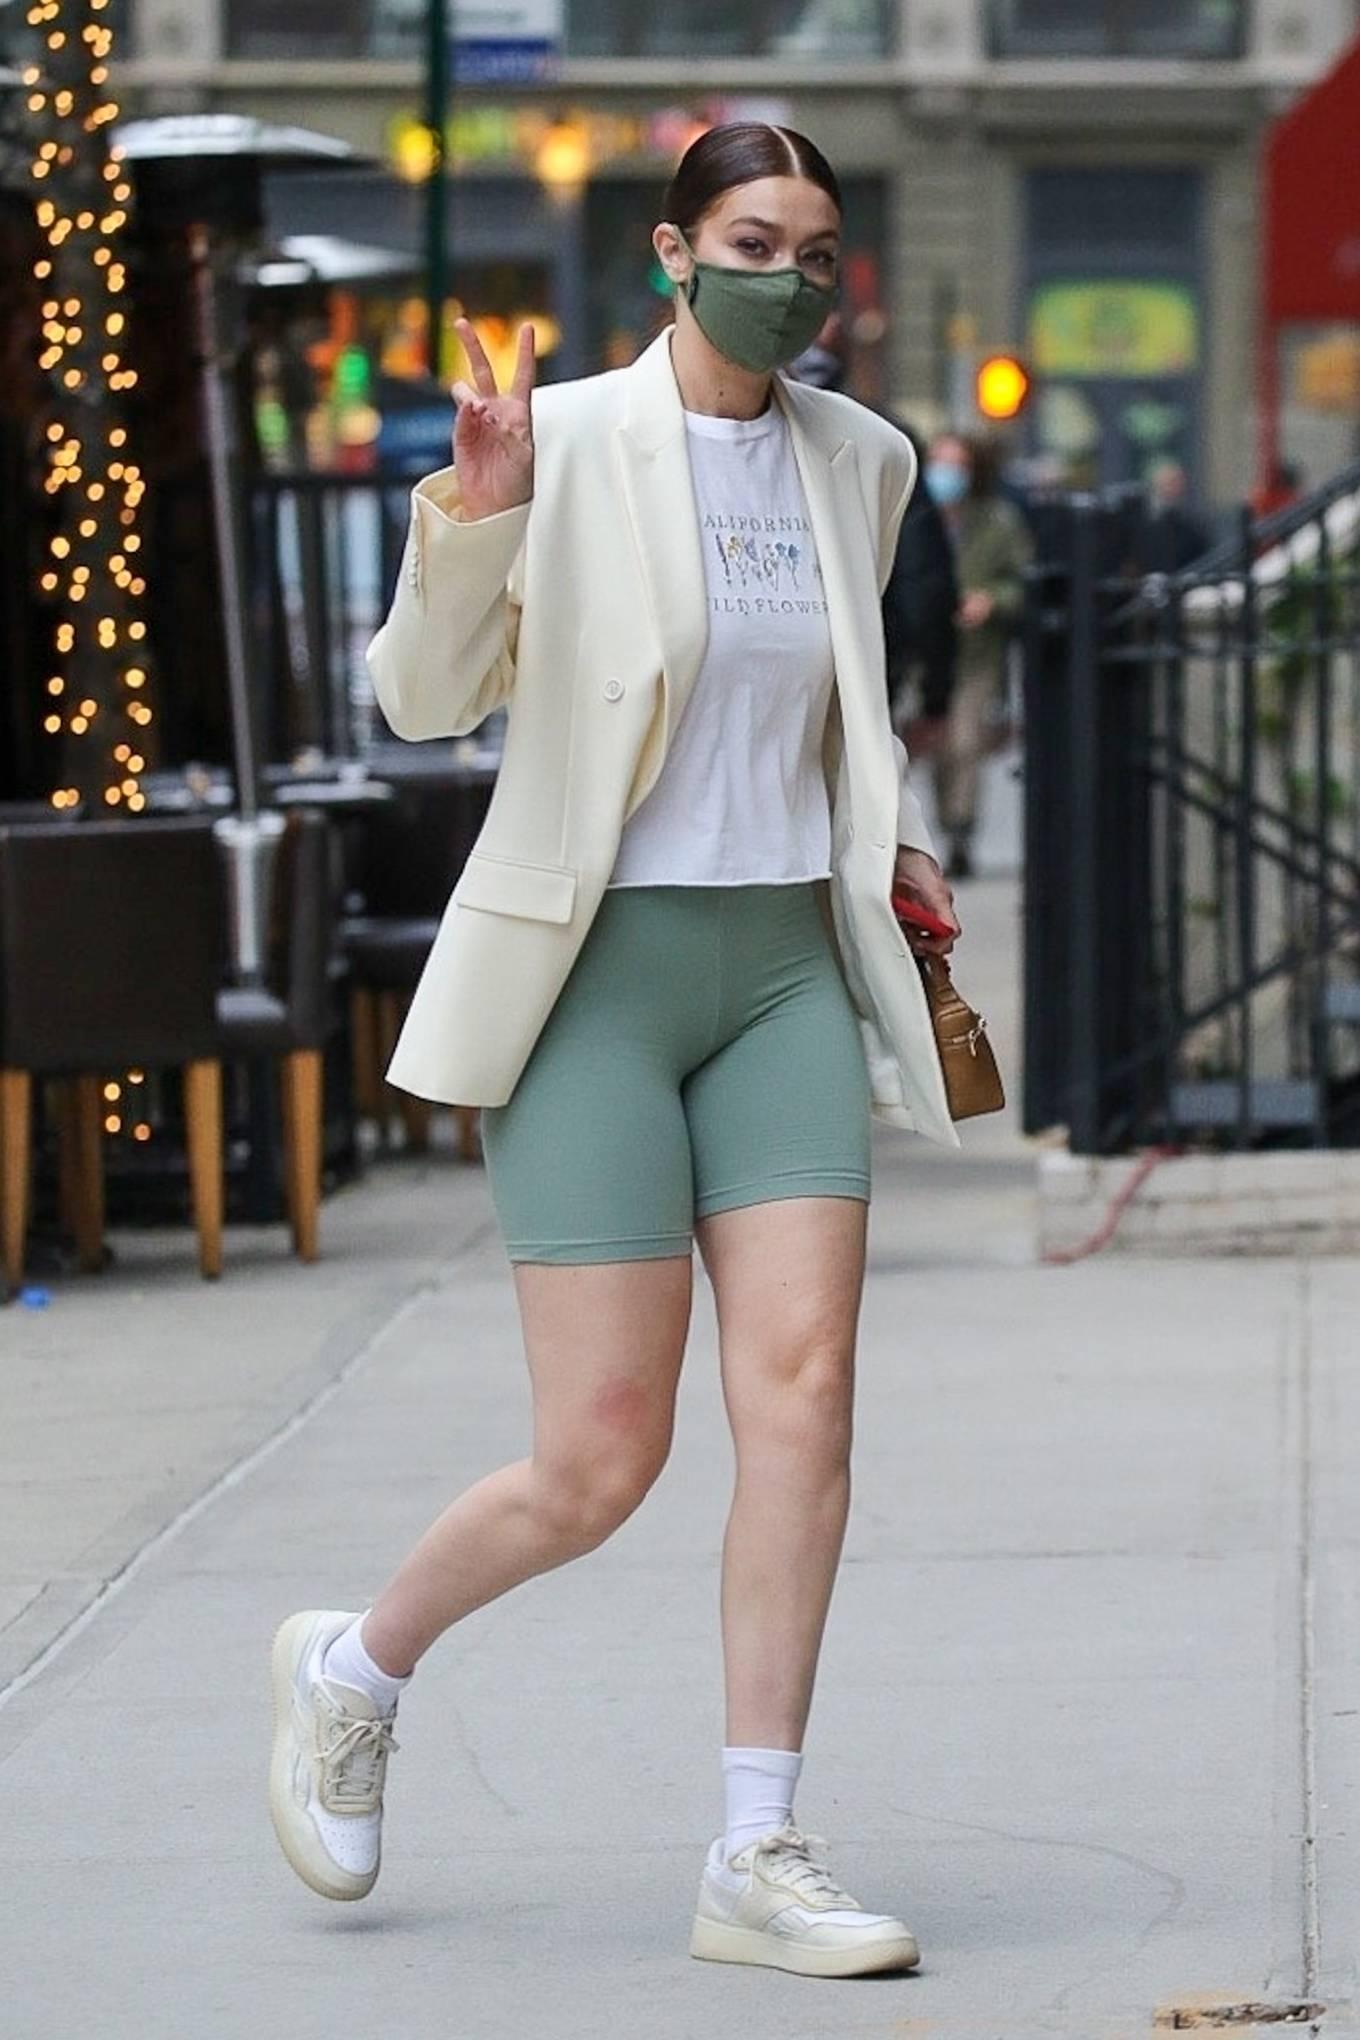 Gigi Hadid rocking round off white Reebok lace-up sneakers with flat heel